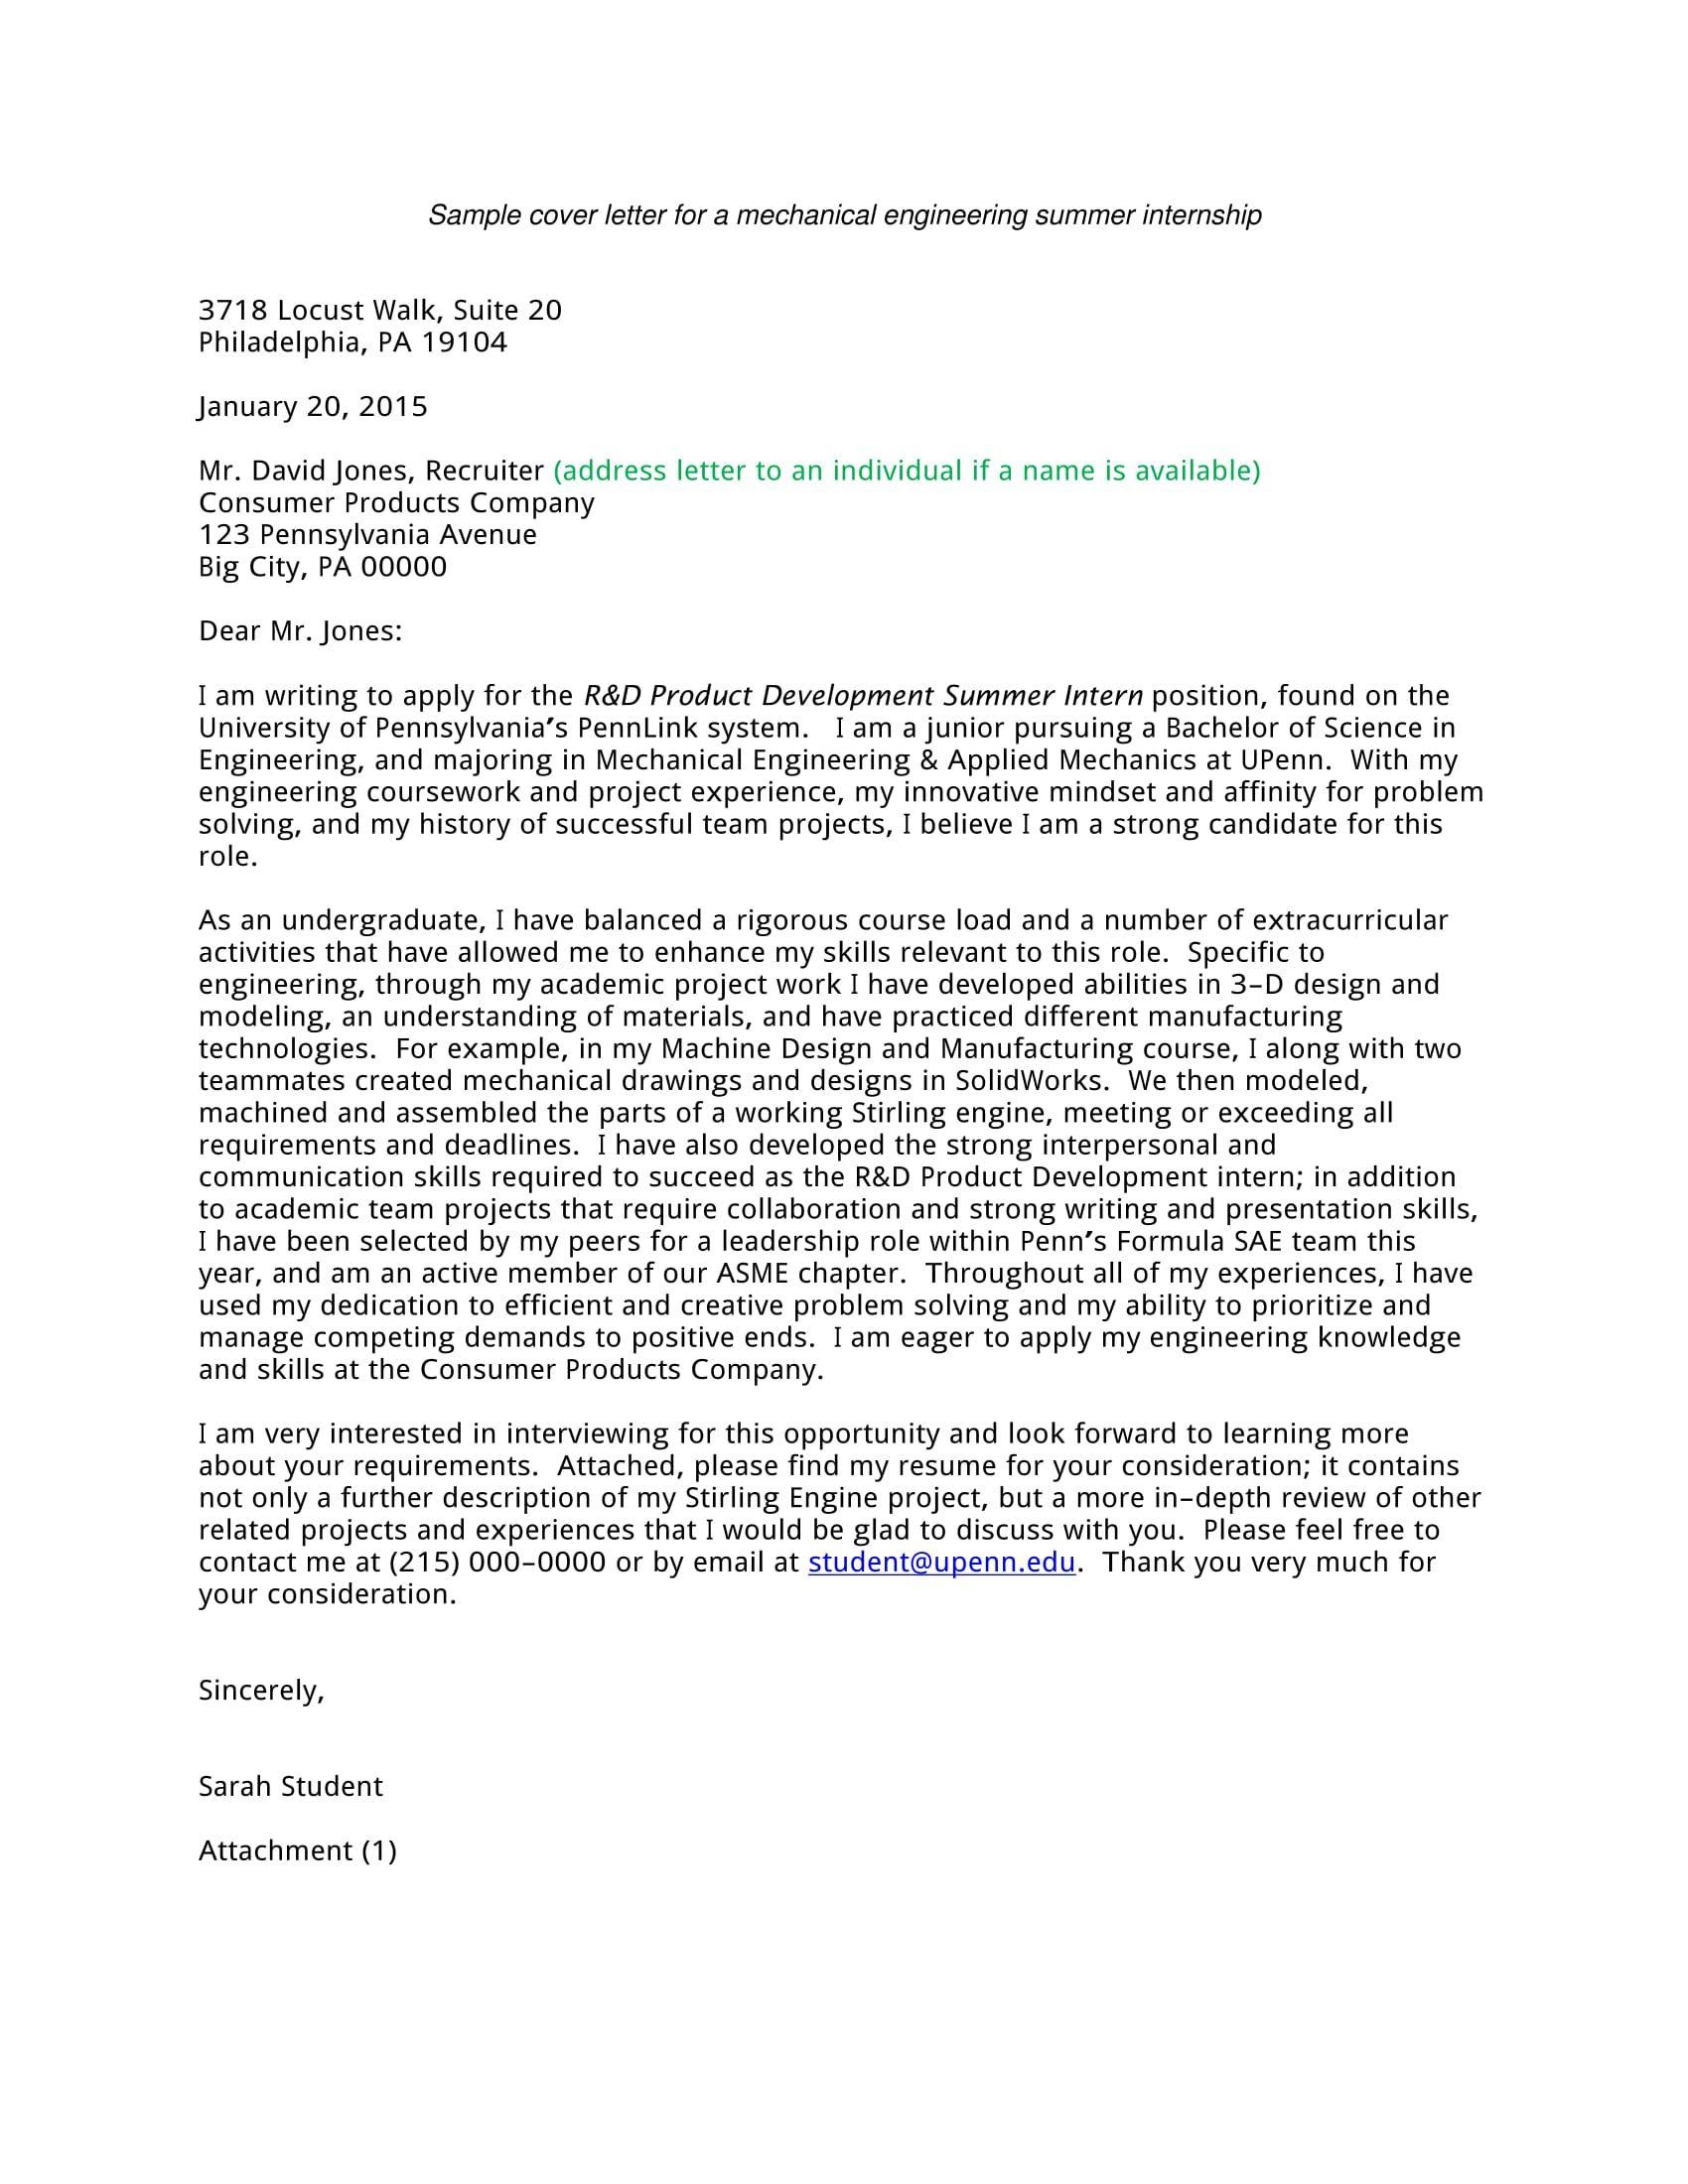 30 Sample Cover Letter For Internship Writing A Cover Letter